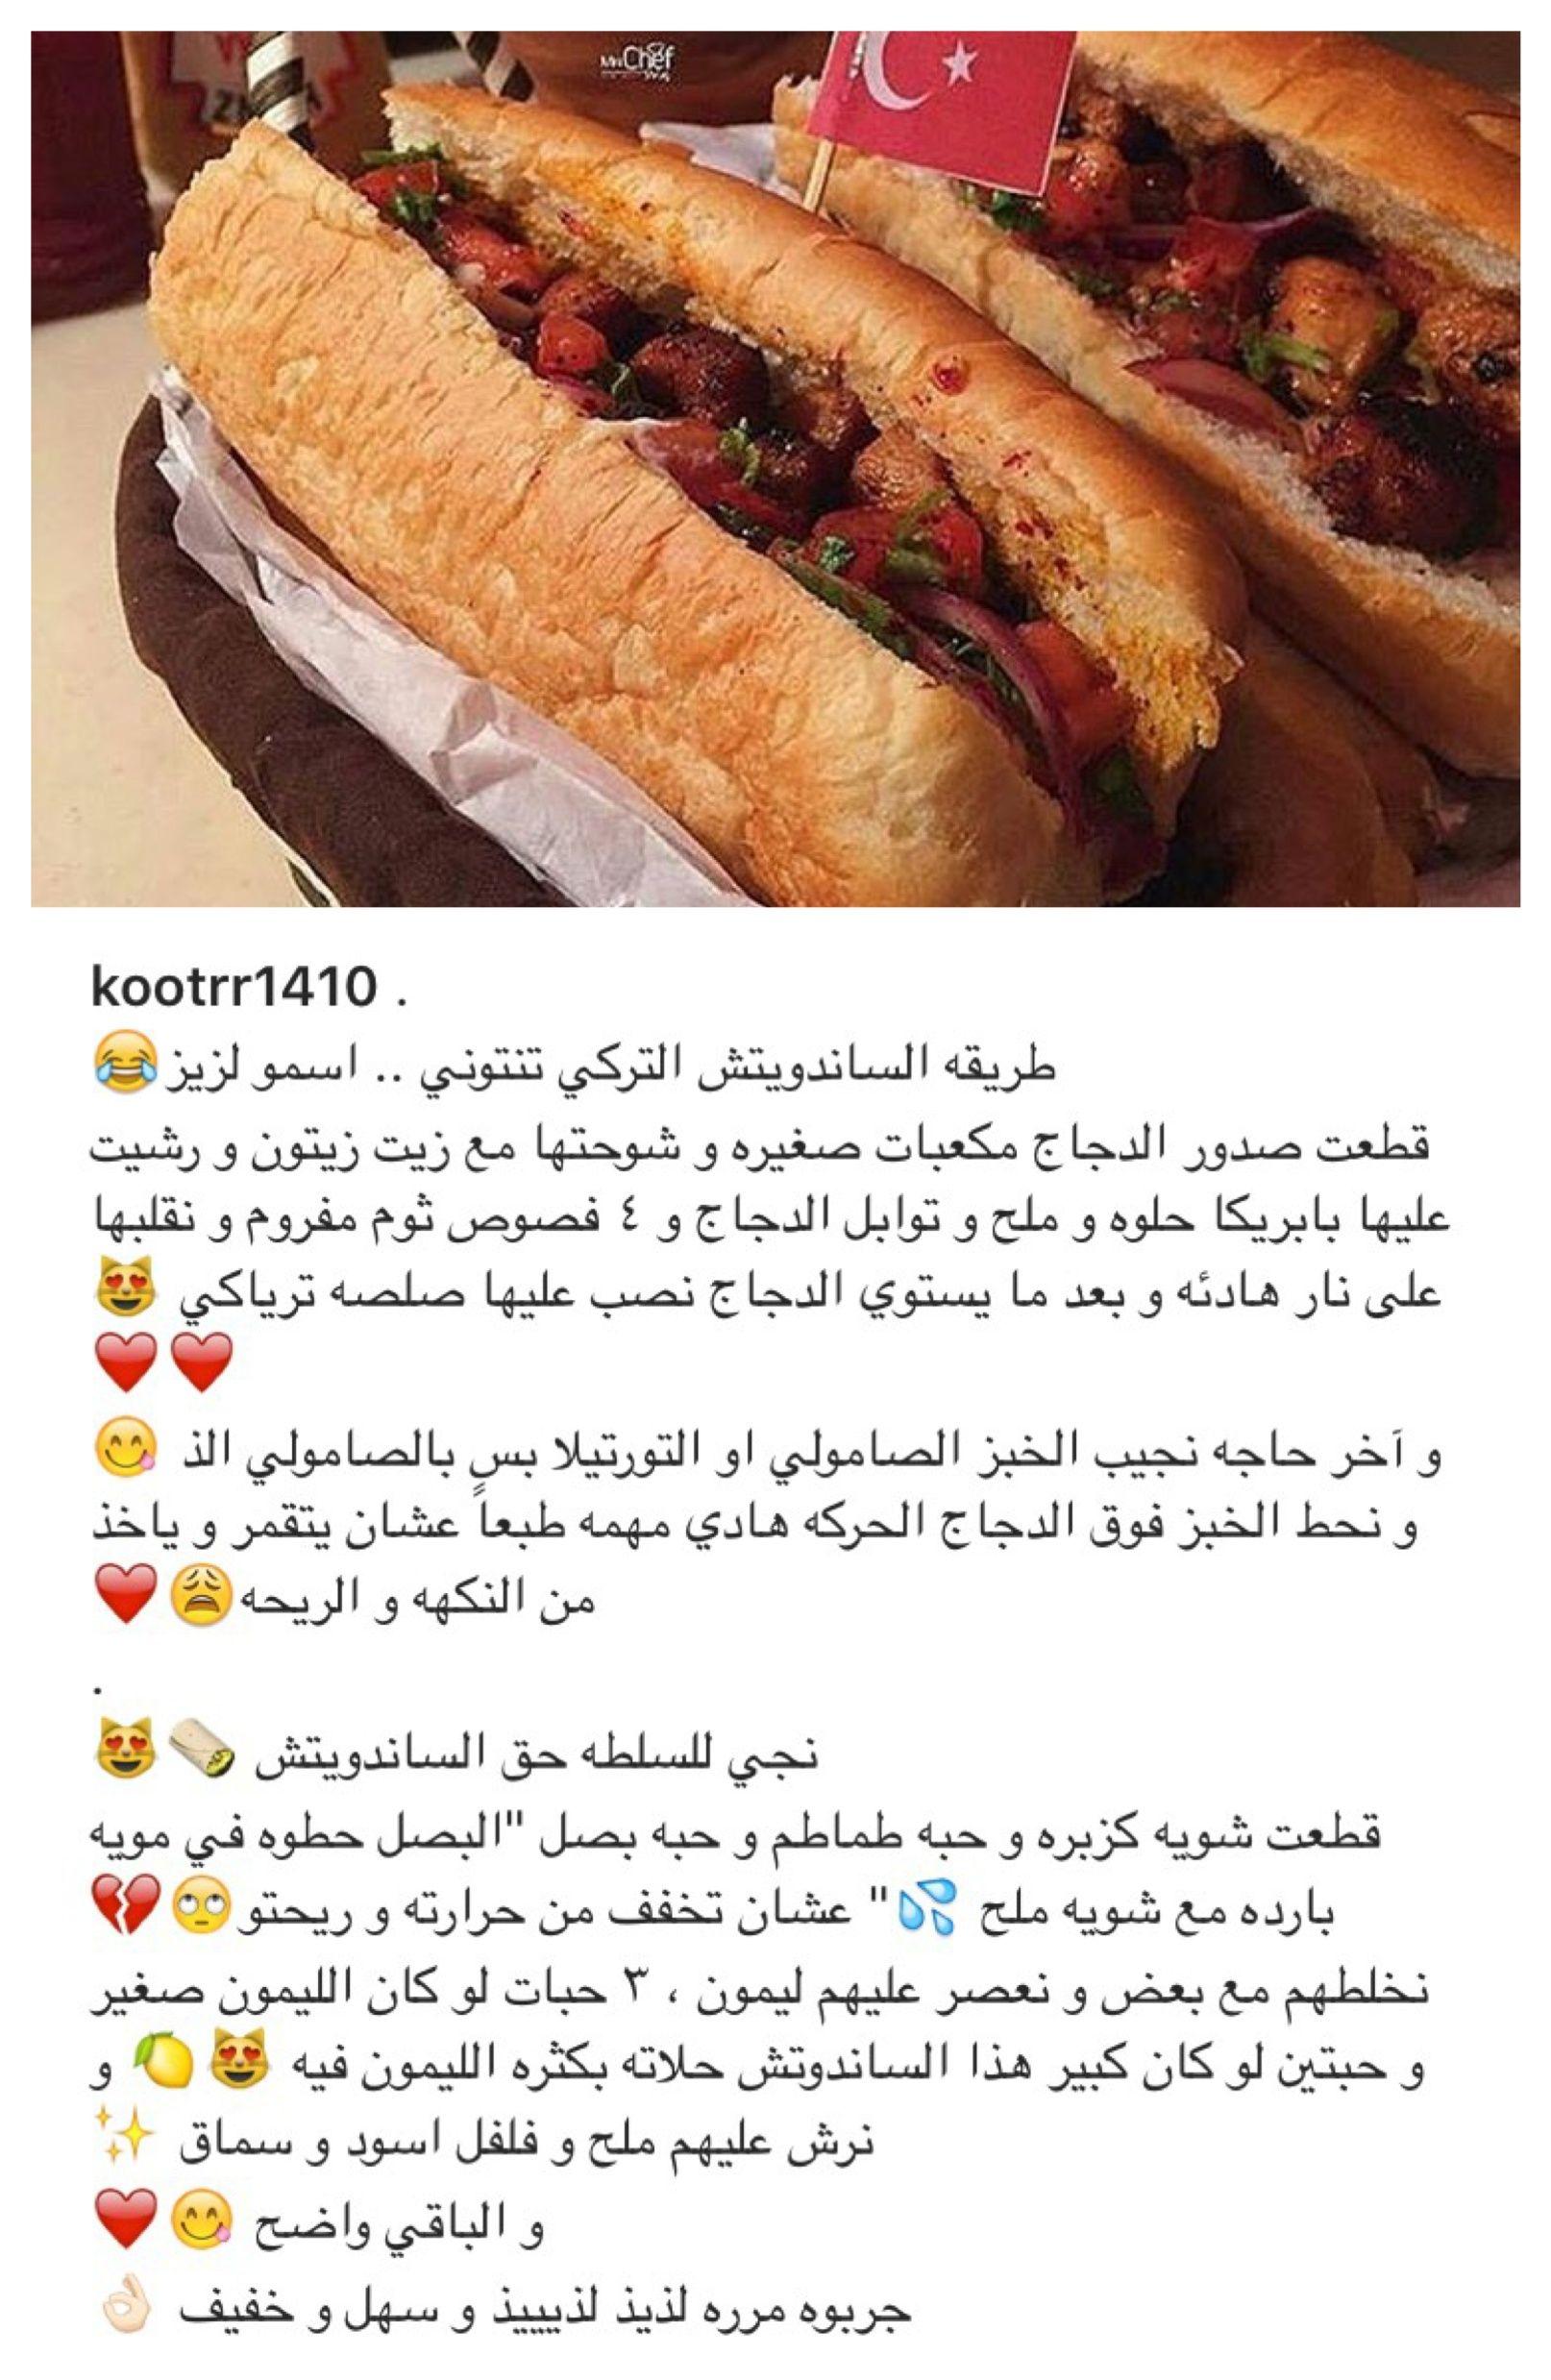 الساندوتش التركي تنتوني Hot Dog Buns Food Dog Bun